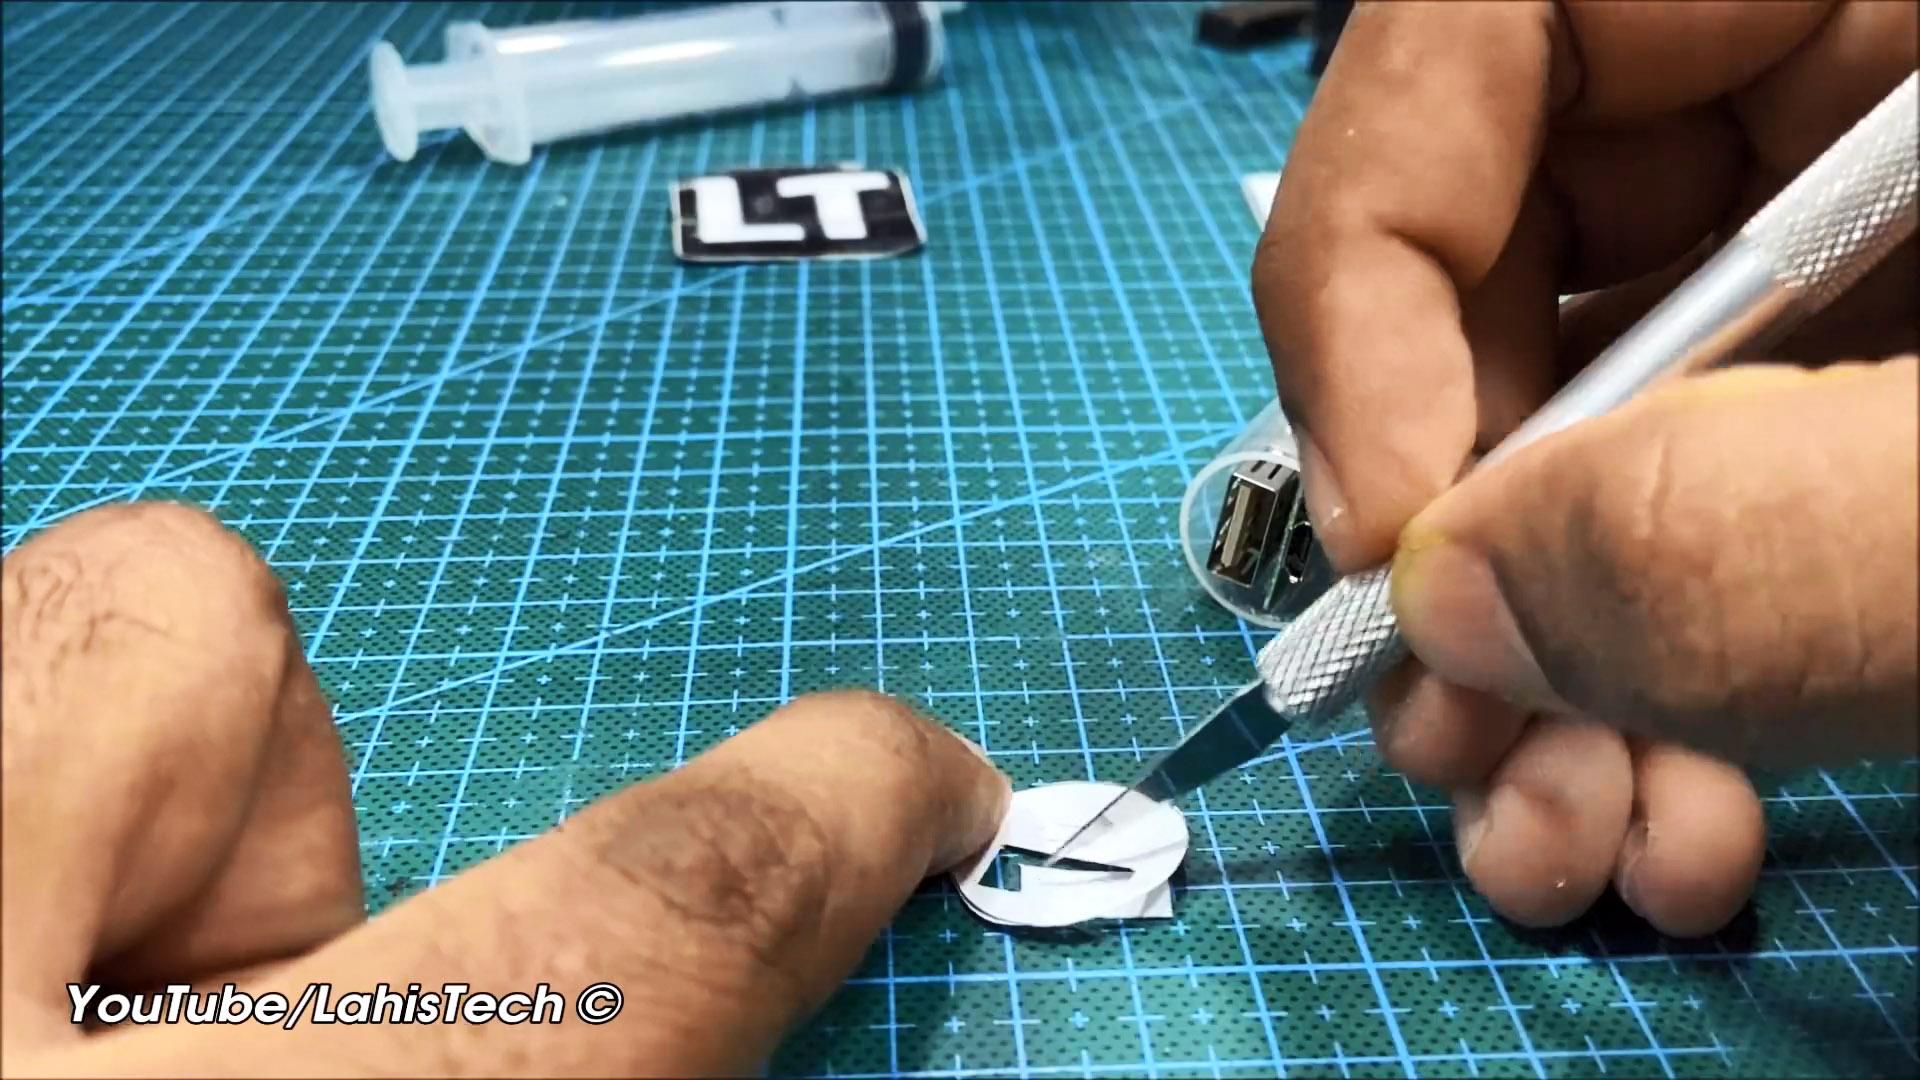 Делаем мини Power Bank на честные 3400 мАч из шприца и аккумулятора 18650